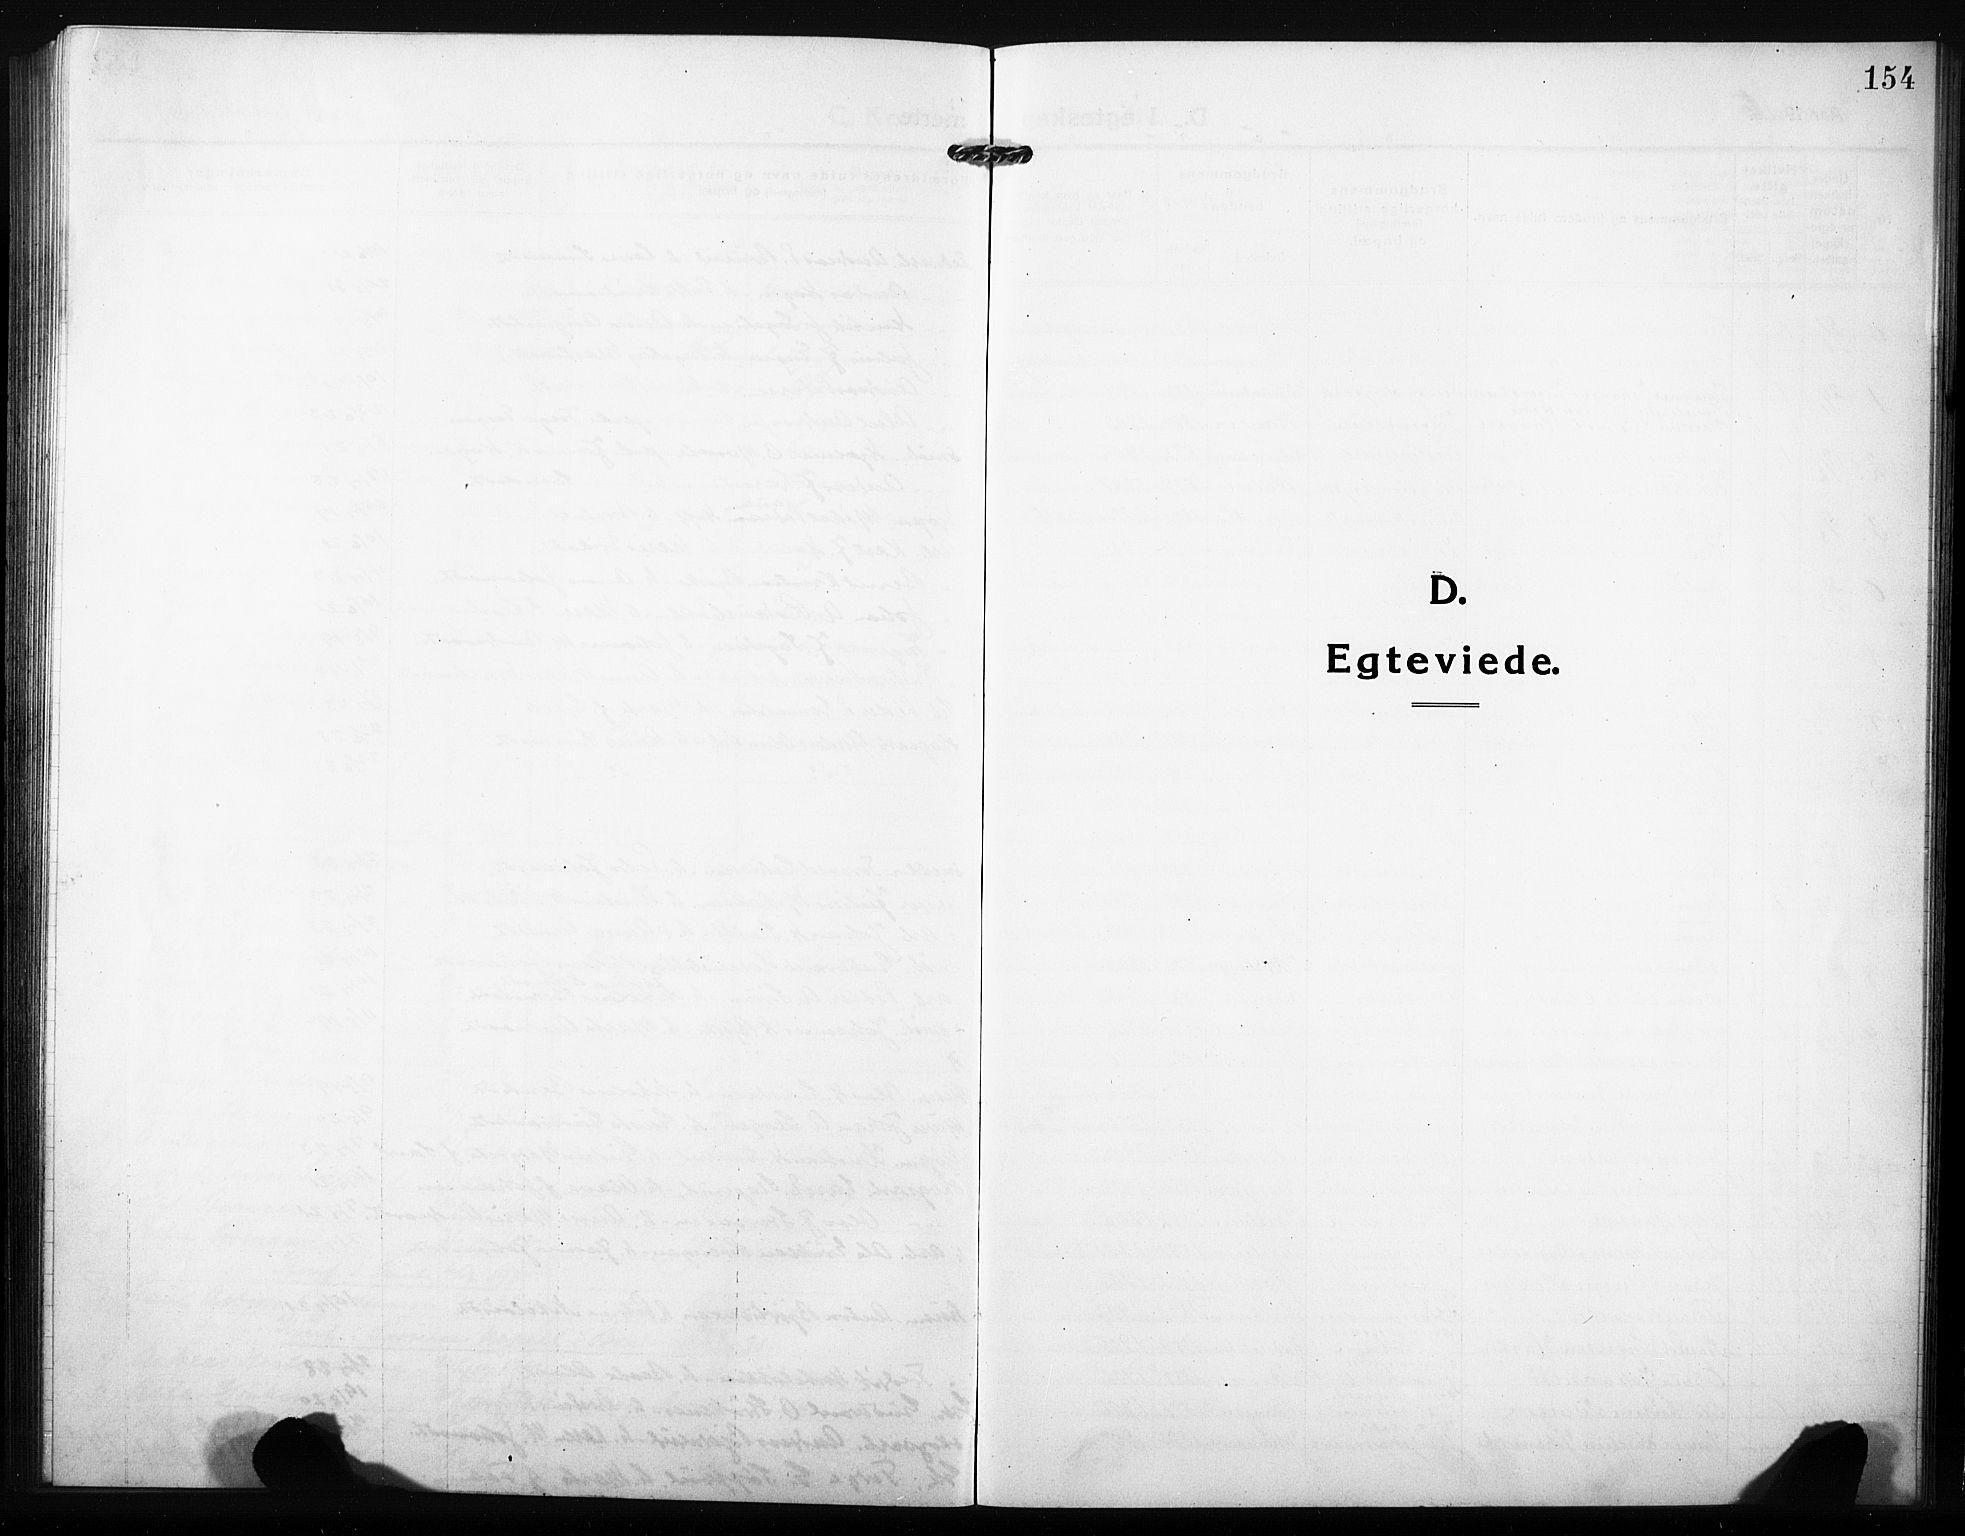 SAH, Søndre Land prestekontor, L/L0007: Klokkerbok nr. 7, 1915-1932, s. 154